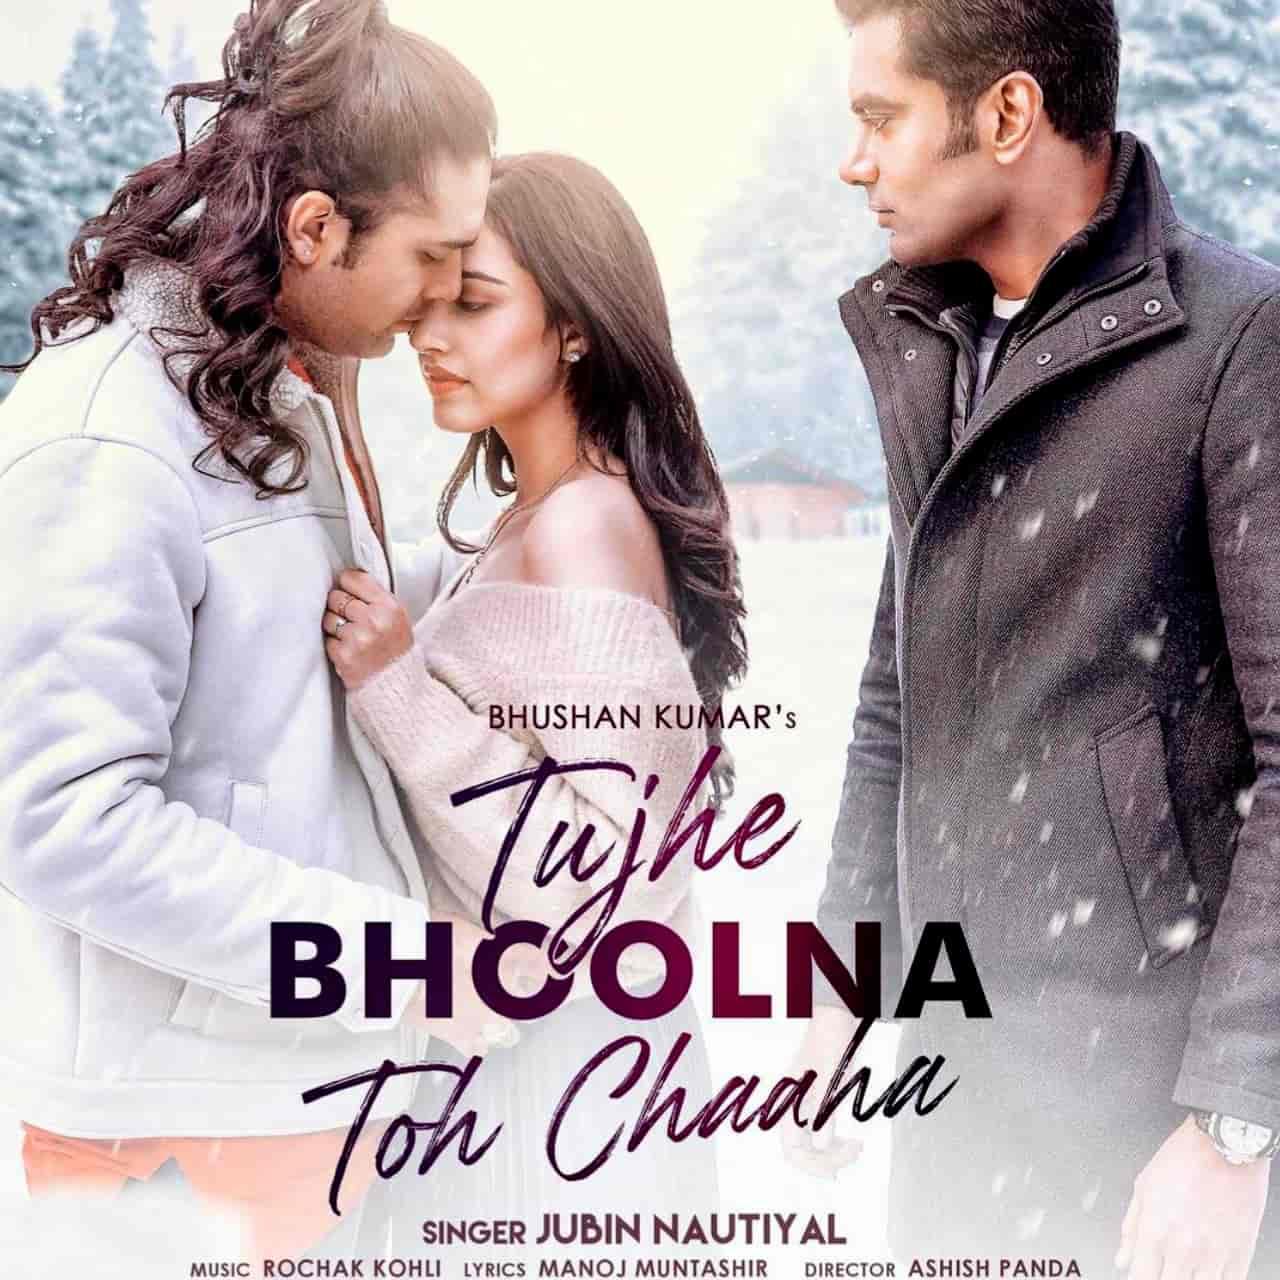 Tujhe bhoolna toh chaaha Love sad Song Lyrics, Sung By Jubin Nautiyal.